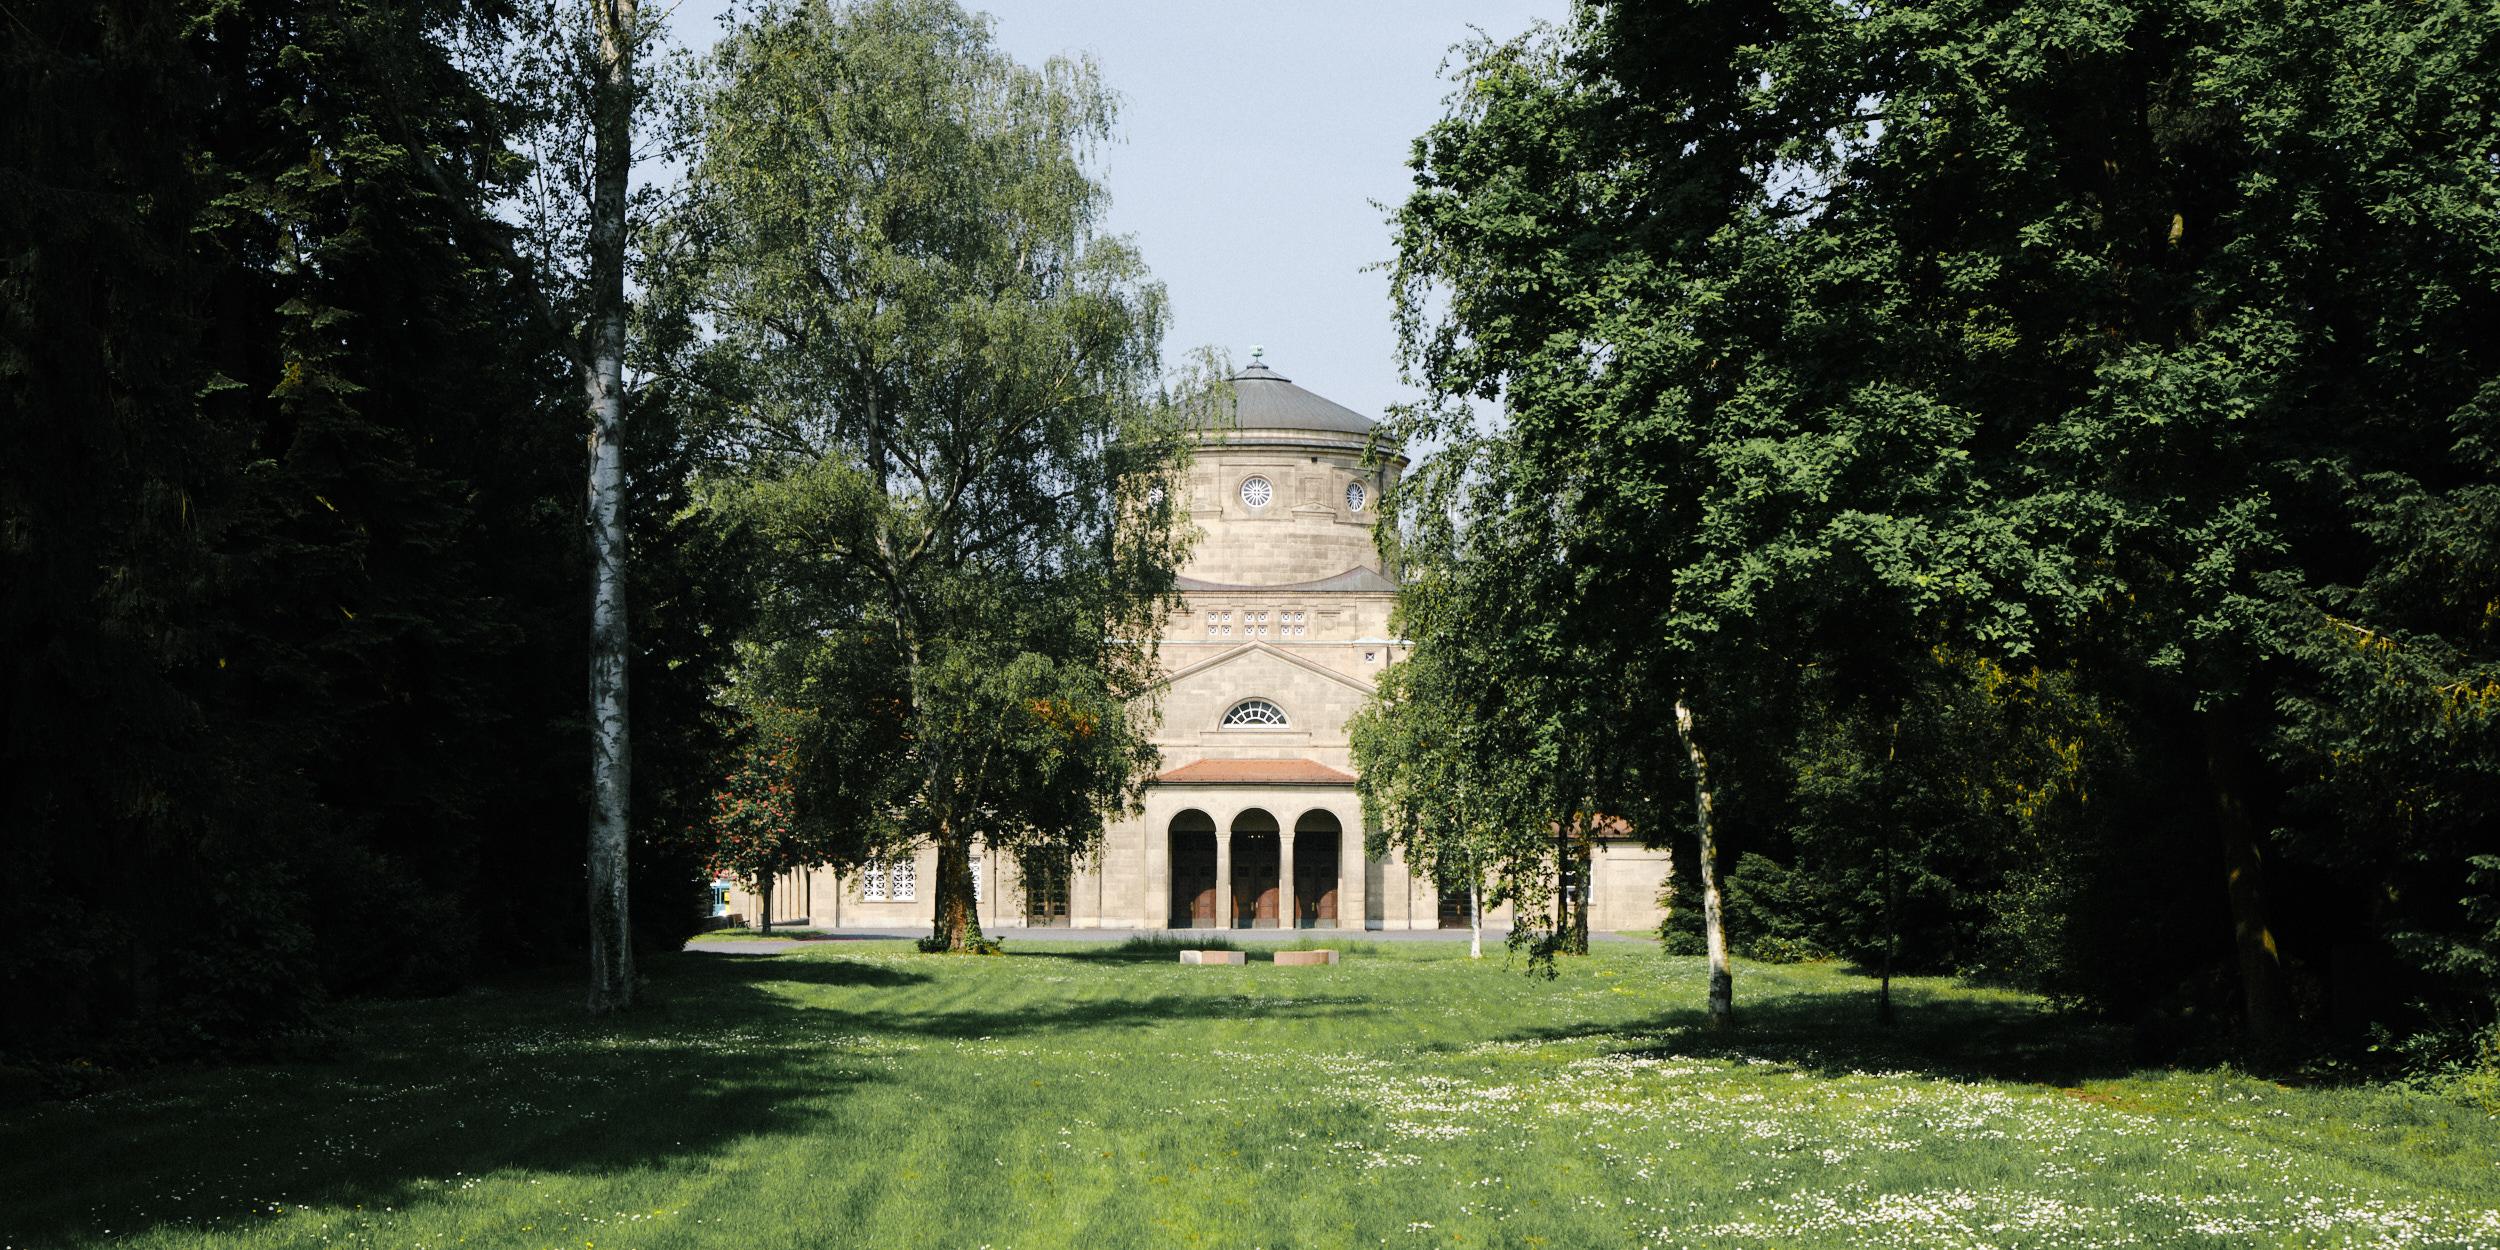 Krematorium auf dem Frankfurter Hauptfriedhof